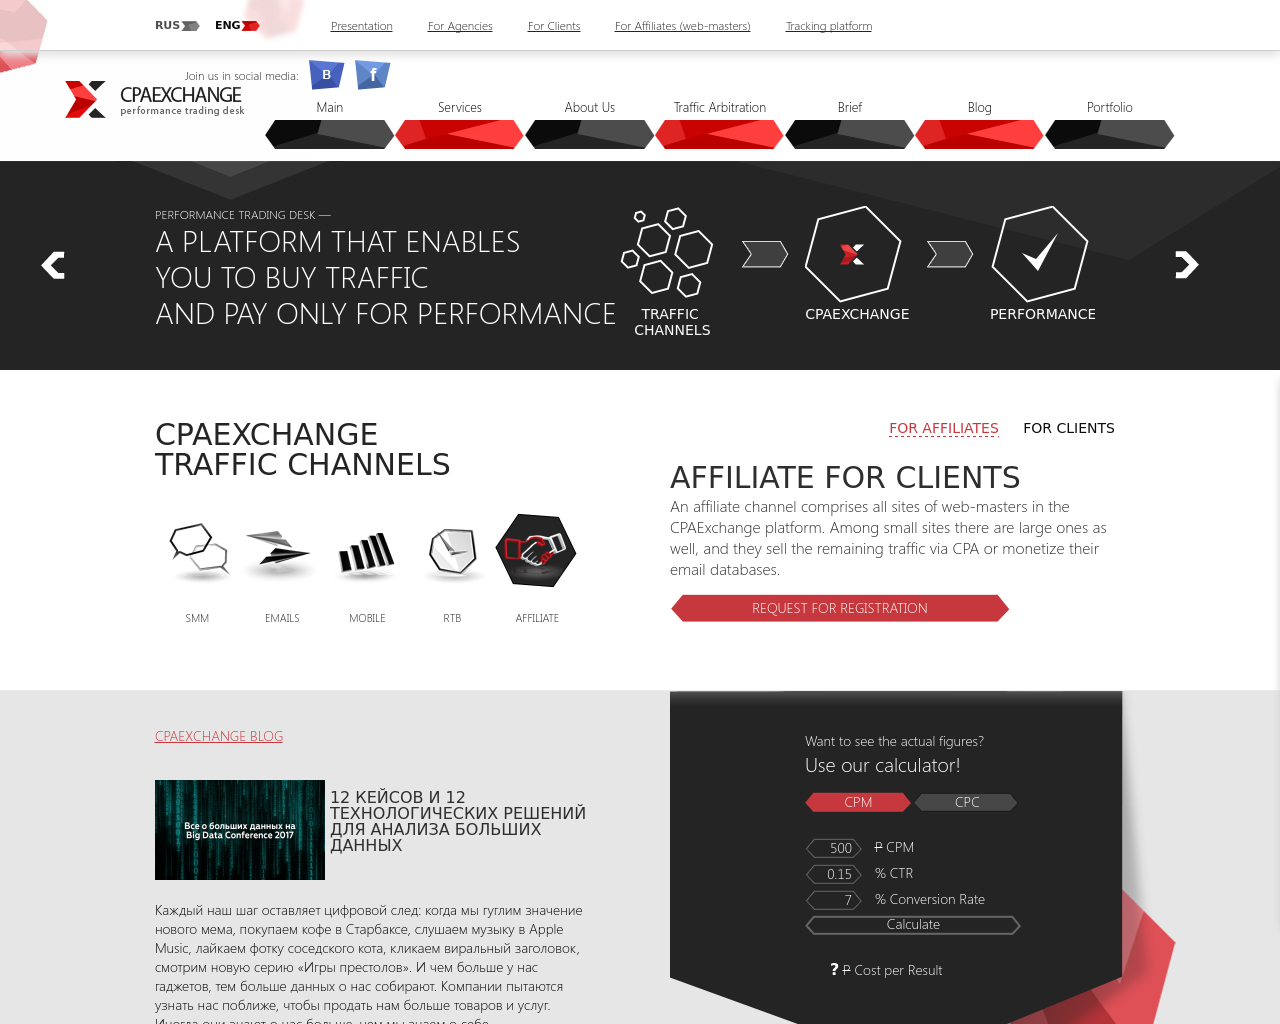 Cpaexchange-Advertising-Reviews-Pricing